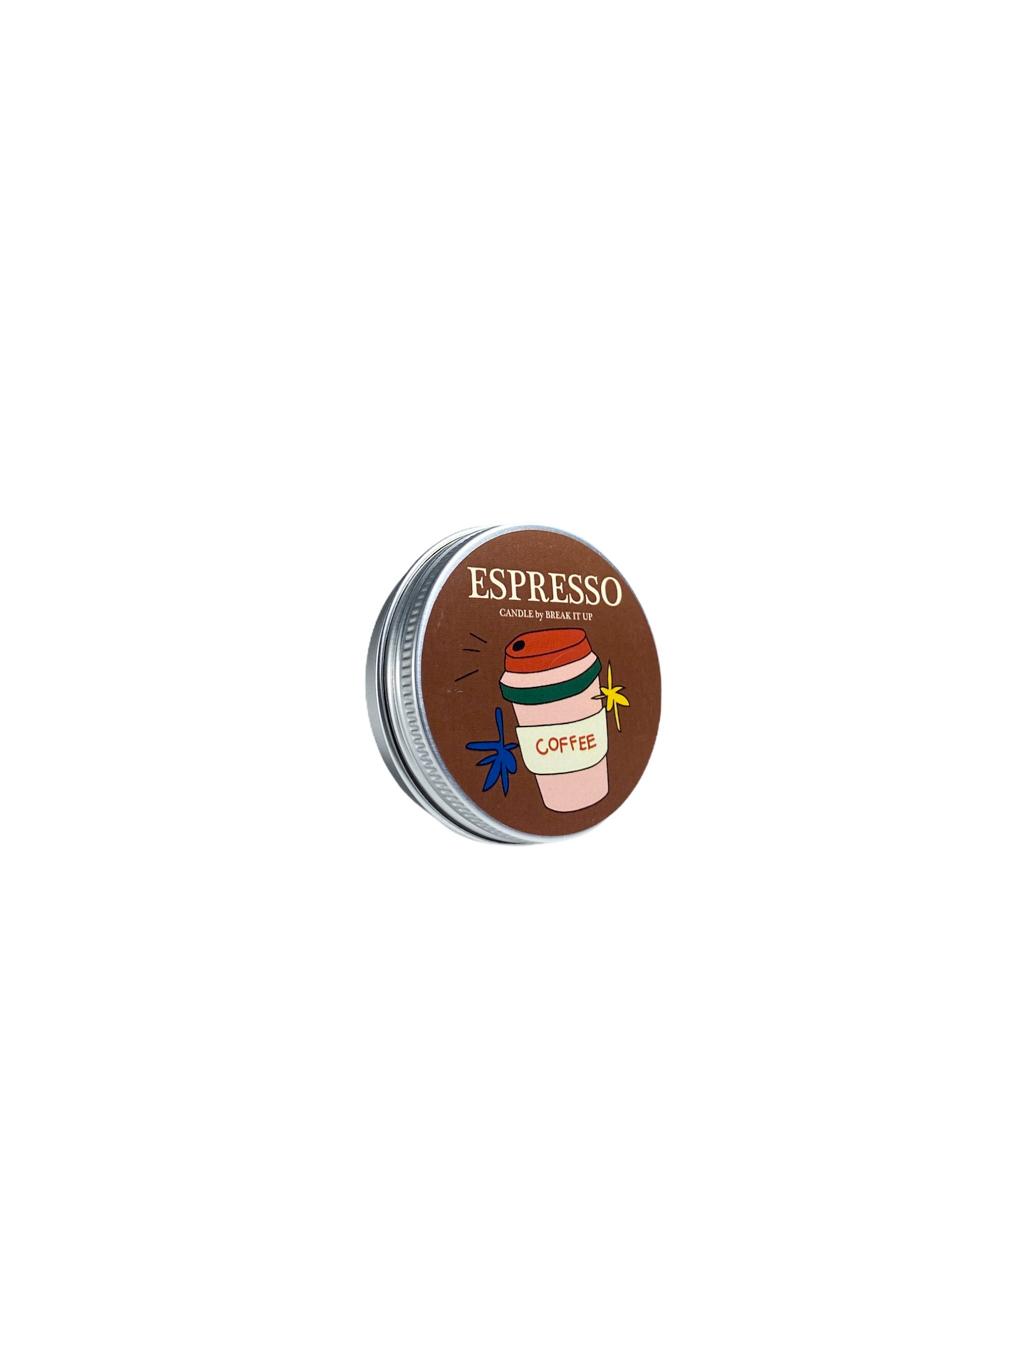 Candle - Espresso